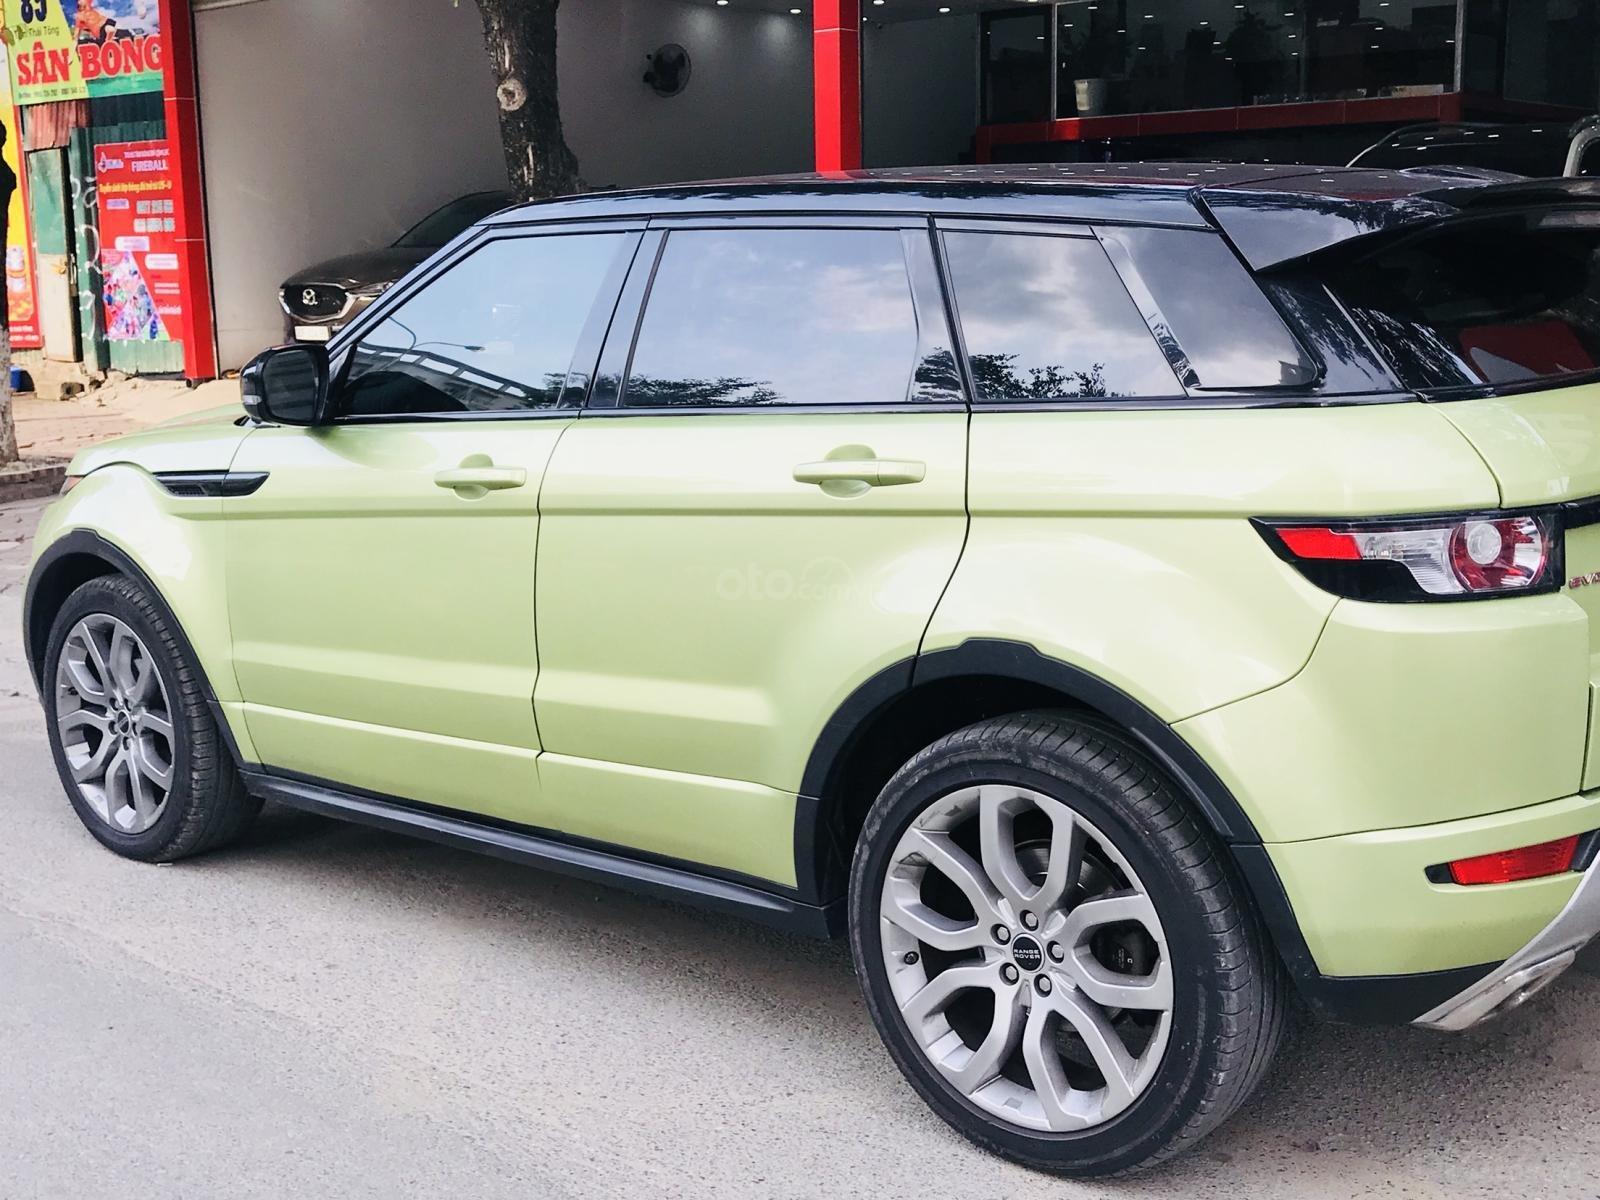 Cần bán xe LandRover Evoque sản xuất 2012 màu xanh (4)